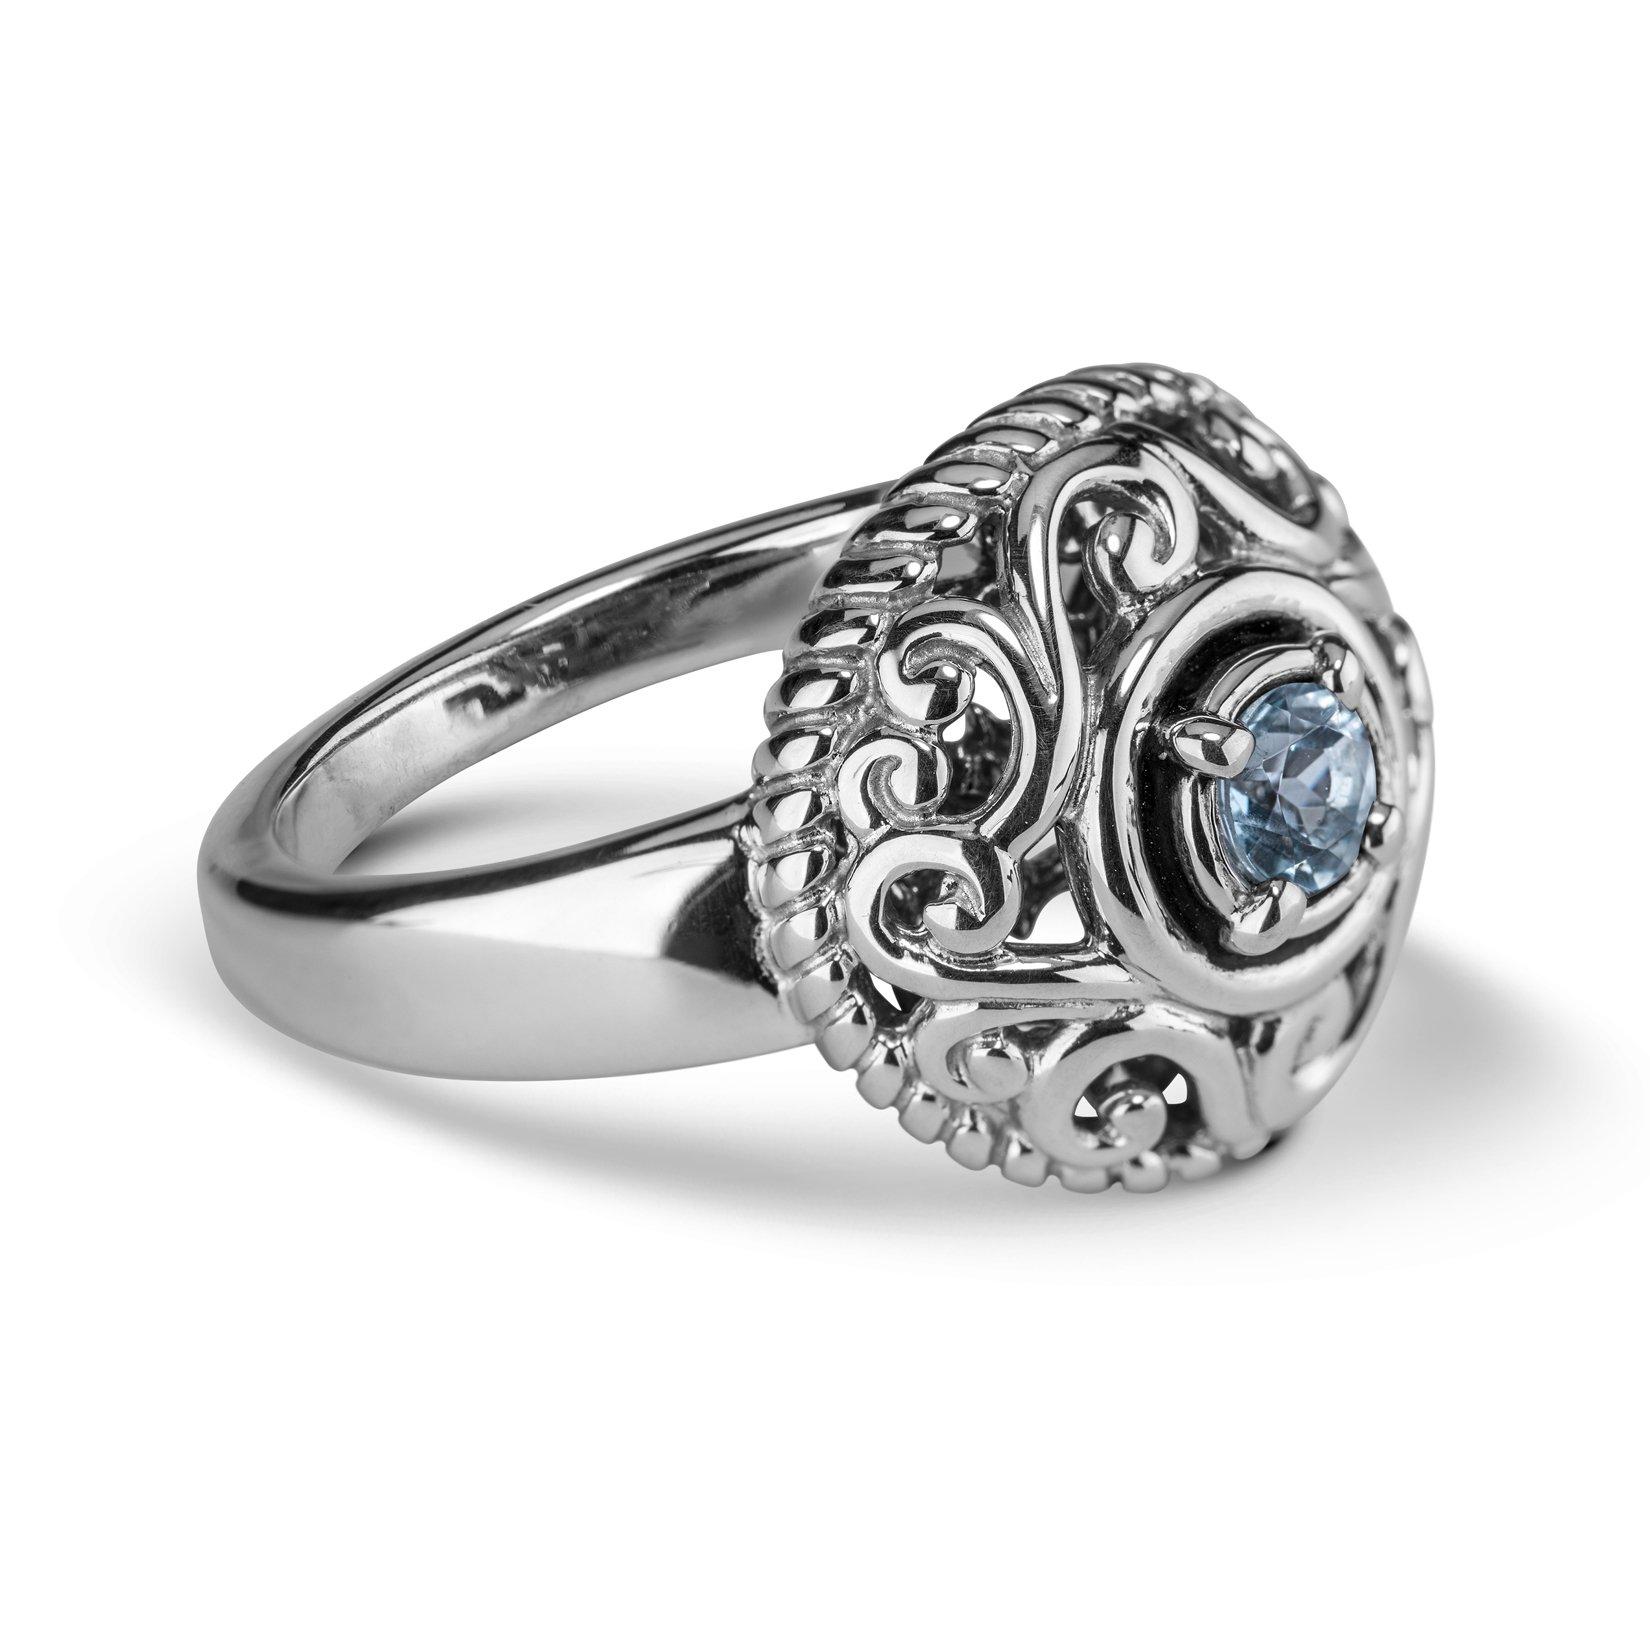 Carolyn Pollack - Sterling Silver Blue Aquamarine Birthstone Ring - Size 9 by Carolyn Pollack (Image #1)